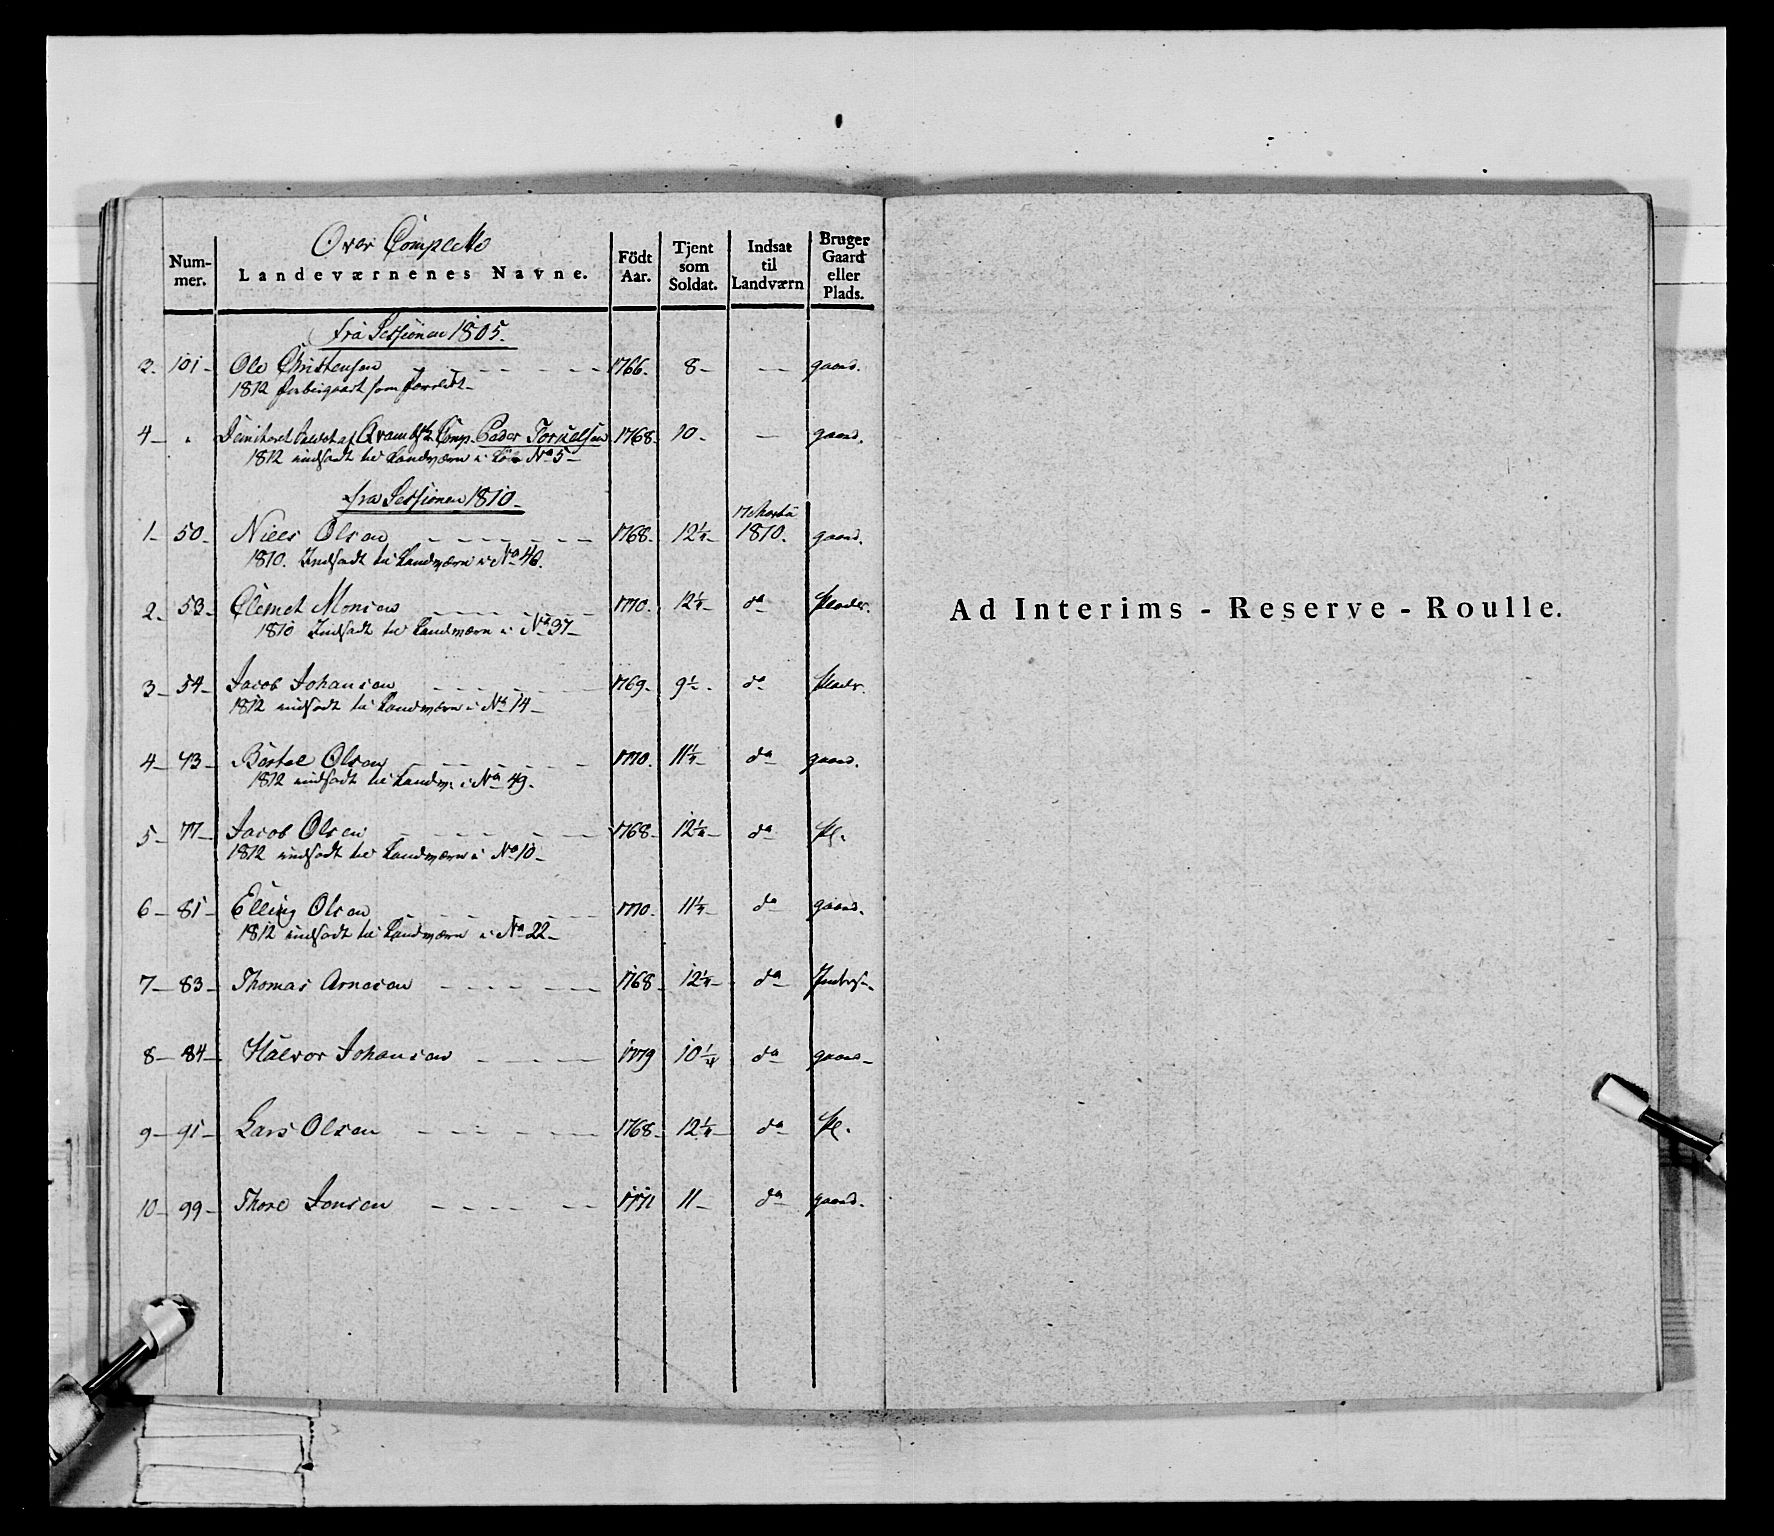 RA, Generalitets- og kommissariatskollegiet, Det kongelige norske kommissariatskollegium, E/Eh/L0069: Opplandske gevorbne infanteriregiment, 1810-1818, s. 549